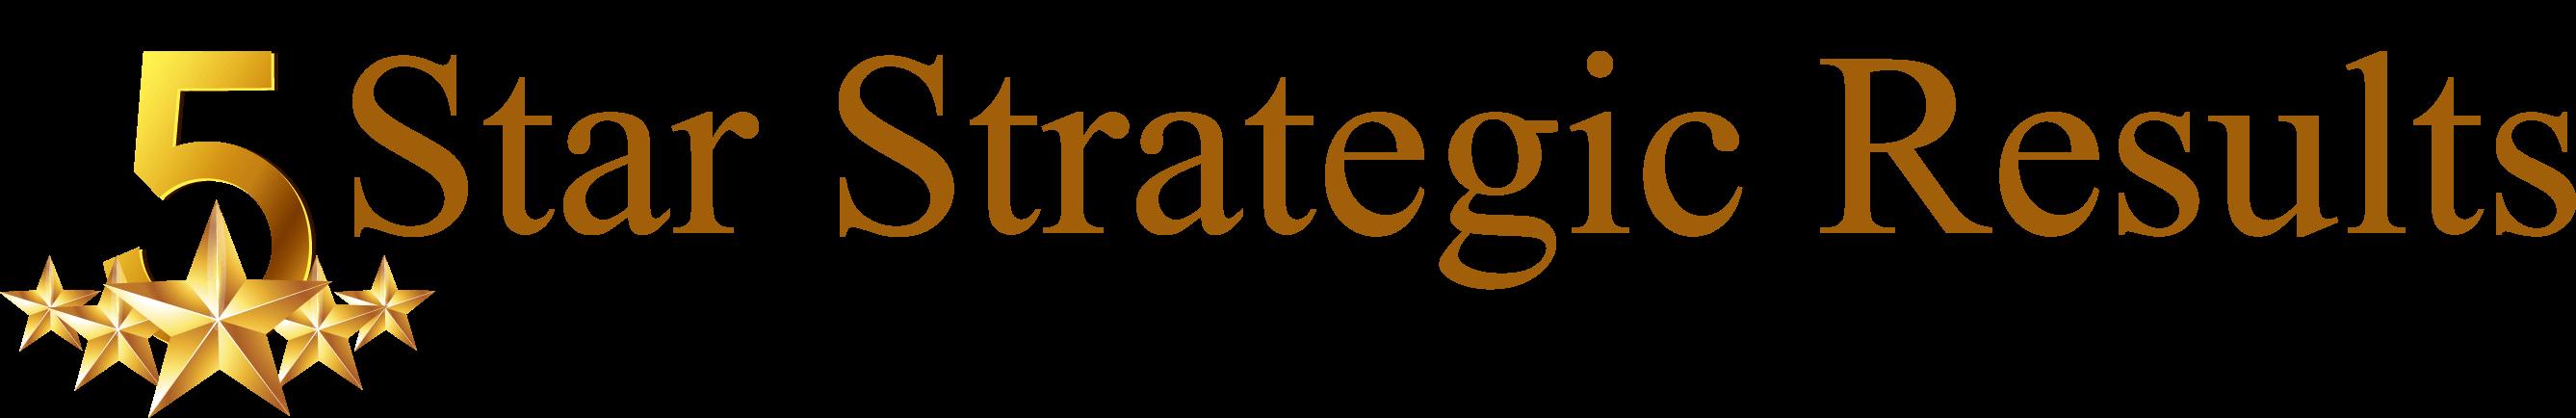 5 star strategic results